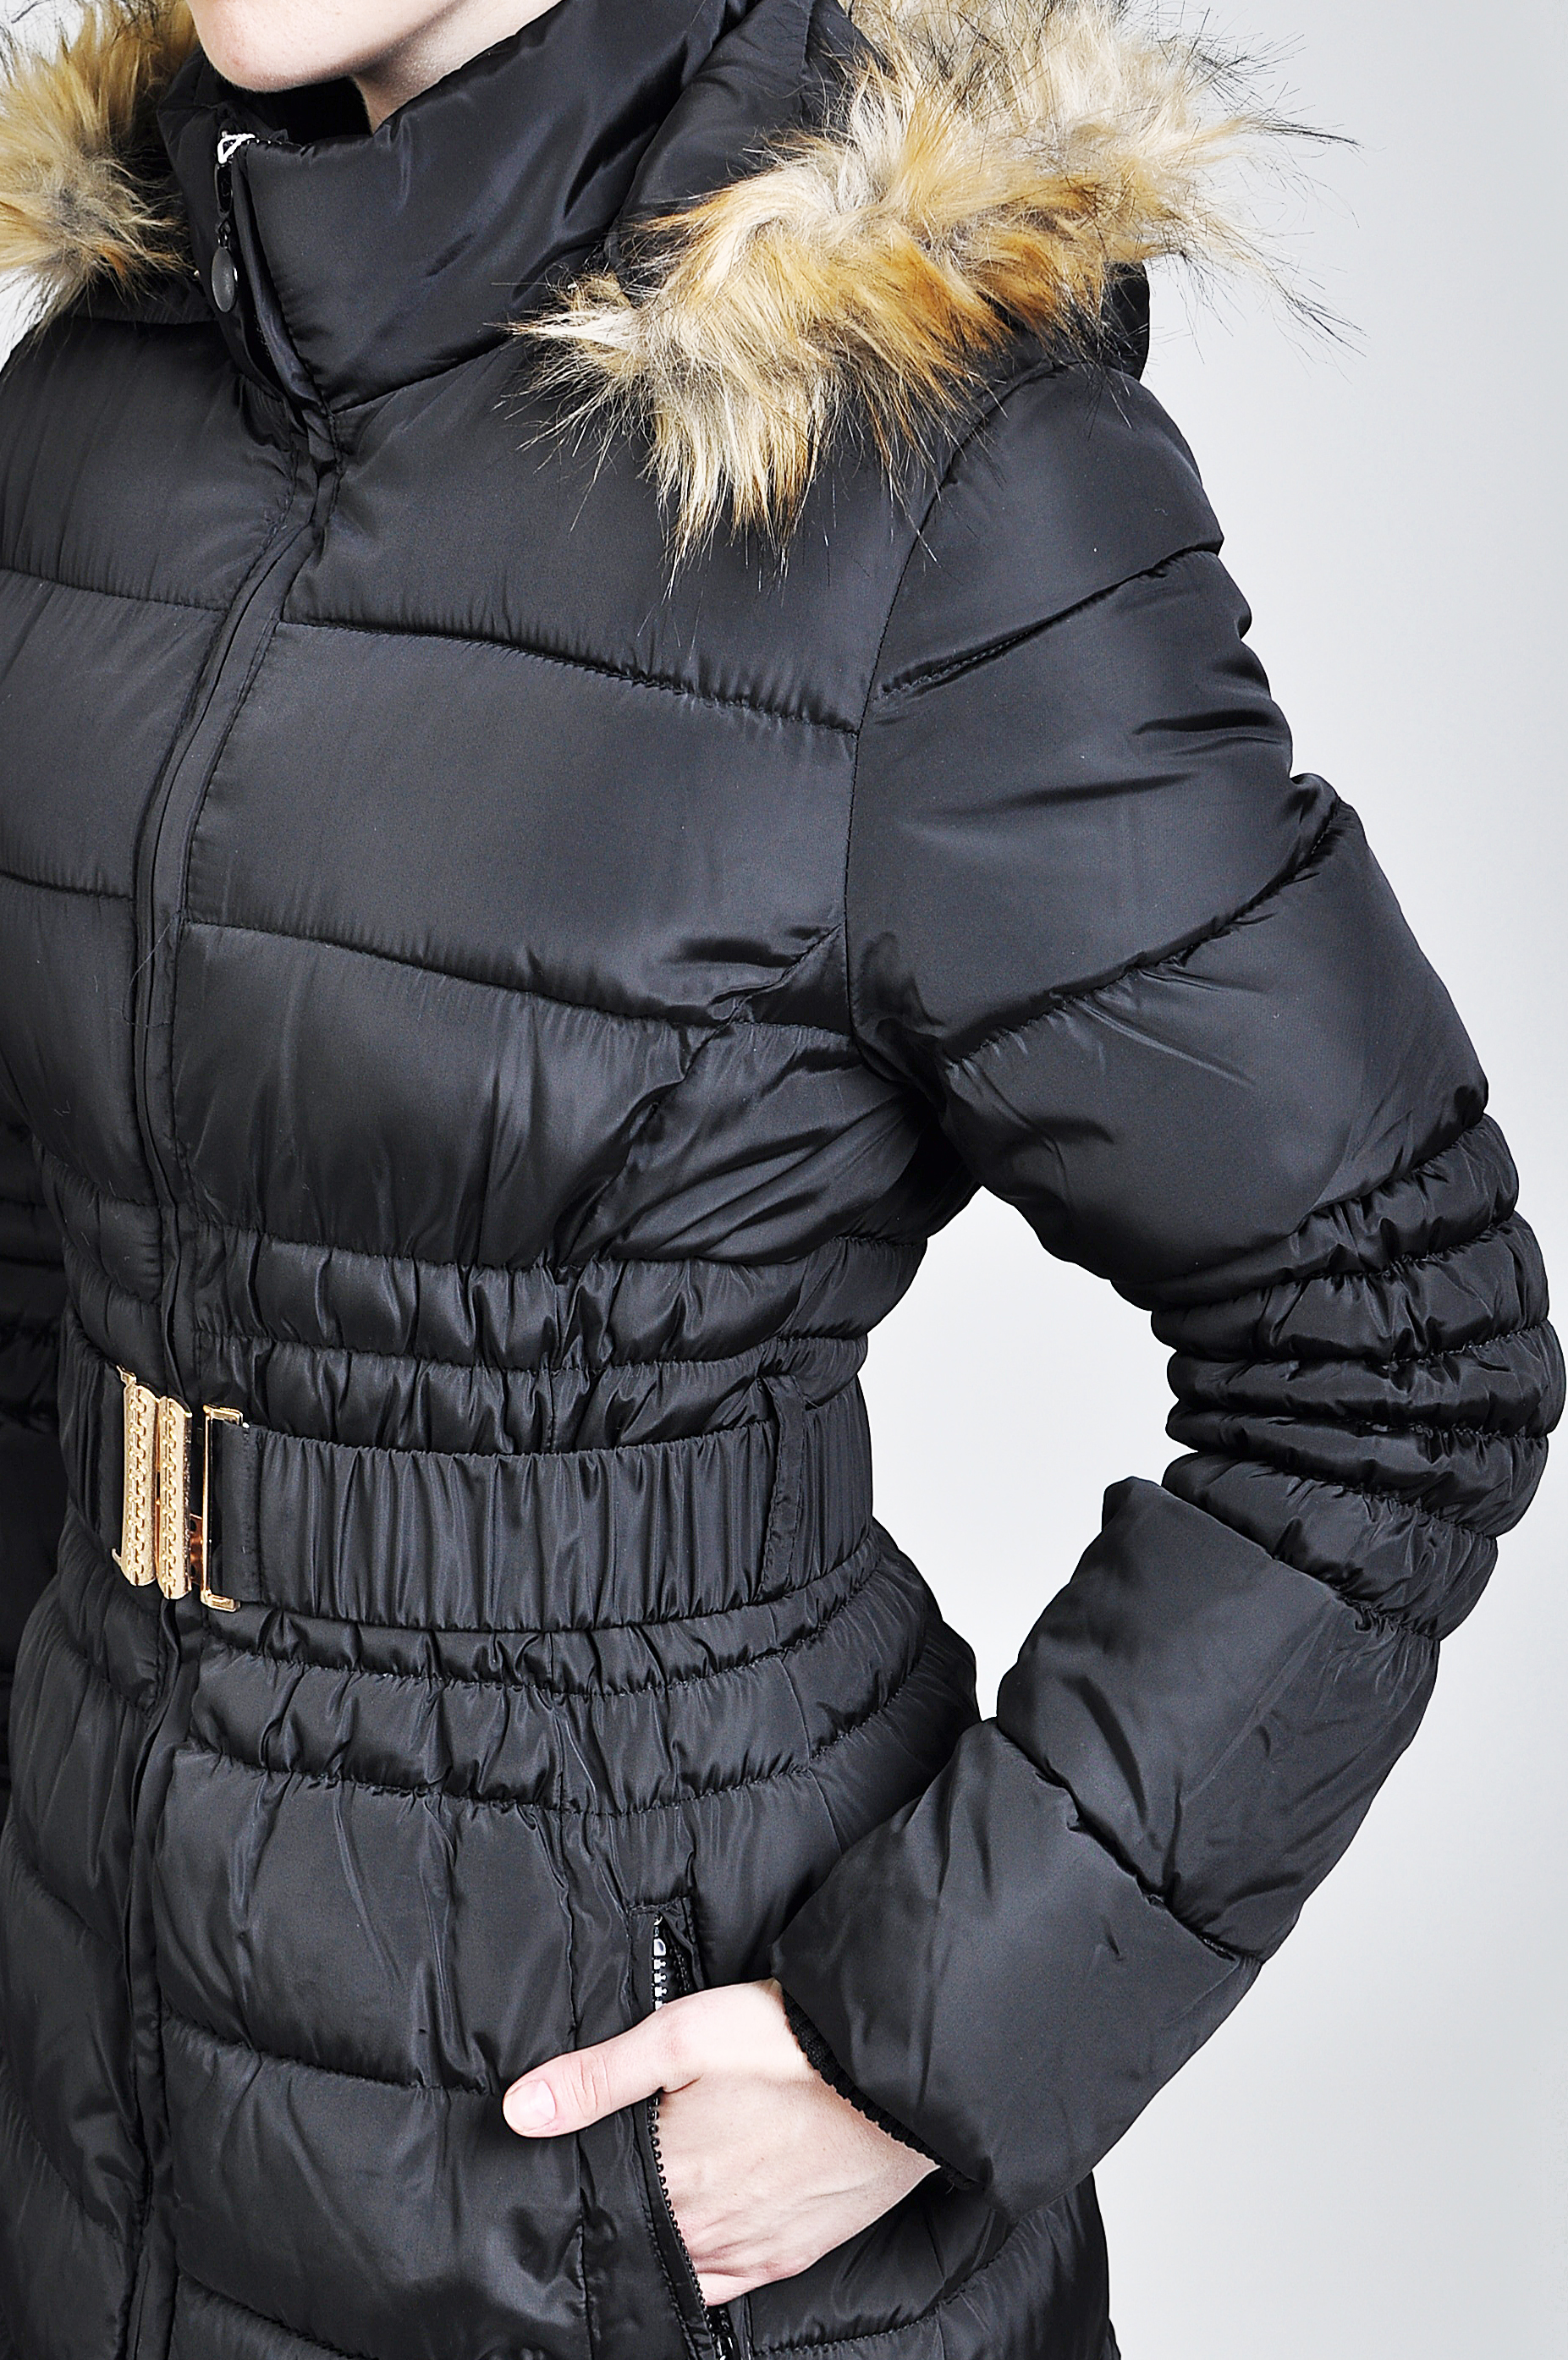 Купить Куртку В Леди Энд Джентльмен